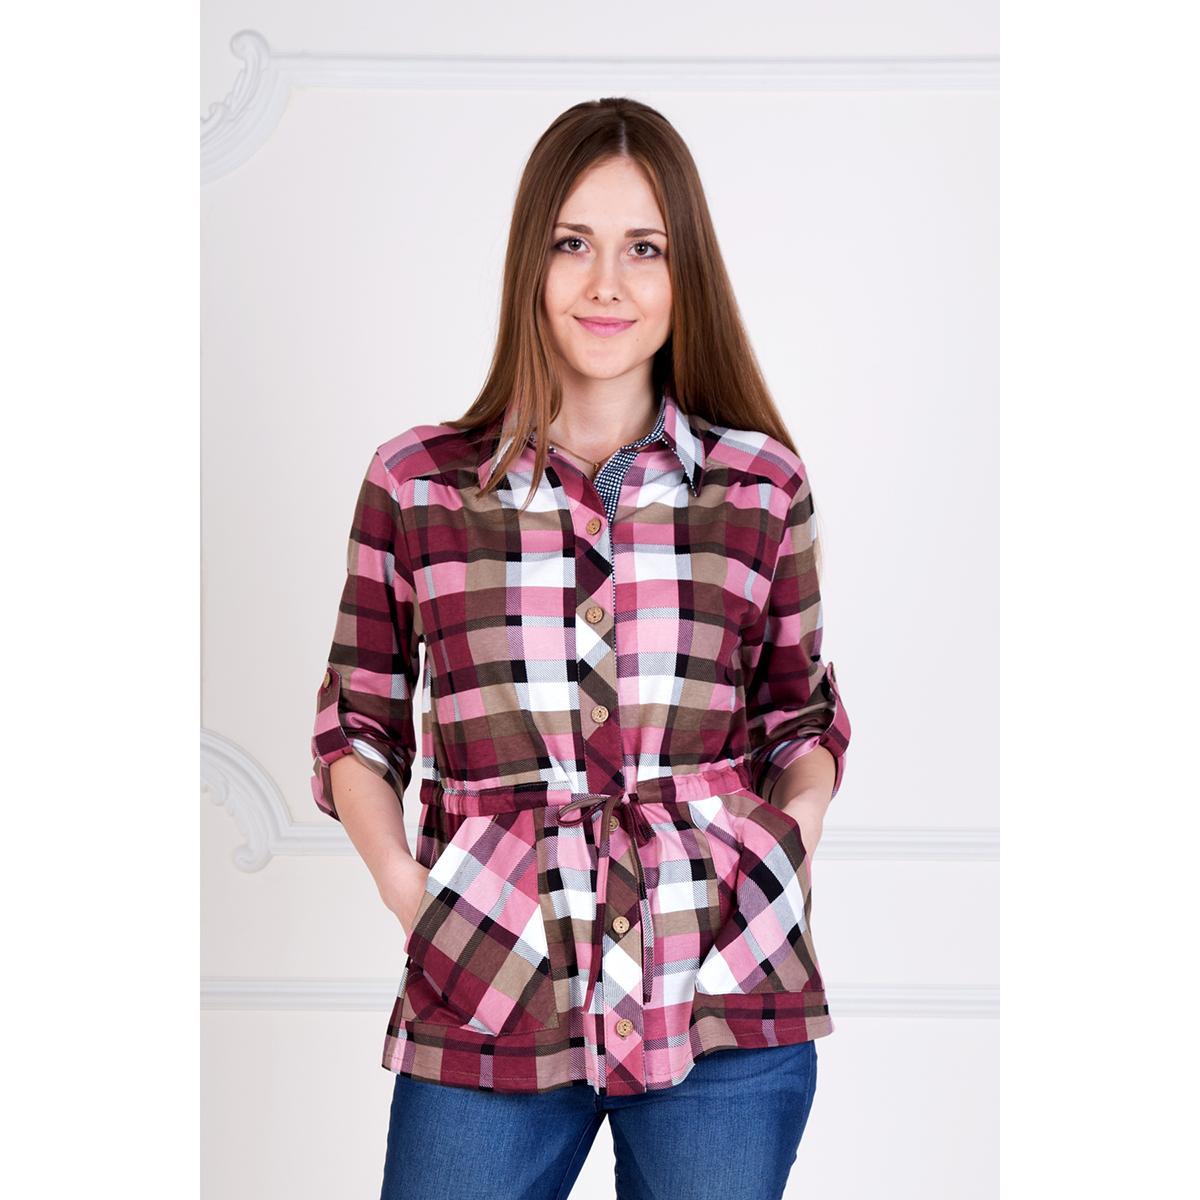 Женская рубашка Клетка Брусничный, размер 46Рубашки<br>Обхват груди:92 см<br>Обхват талии:74 см<br>Обхват бедер:100 см<br>Рост:167 см<br><br>Тип: Жен. рубашка<br>Размер: 46<br>Материал: Кулирка